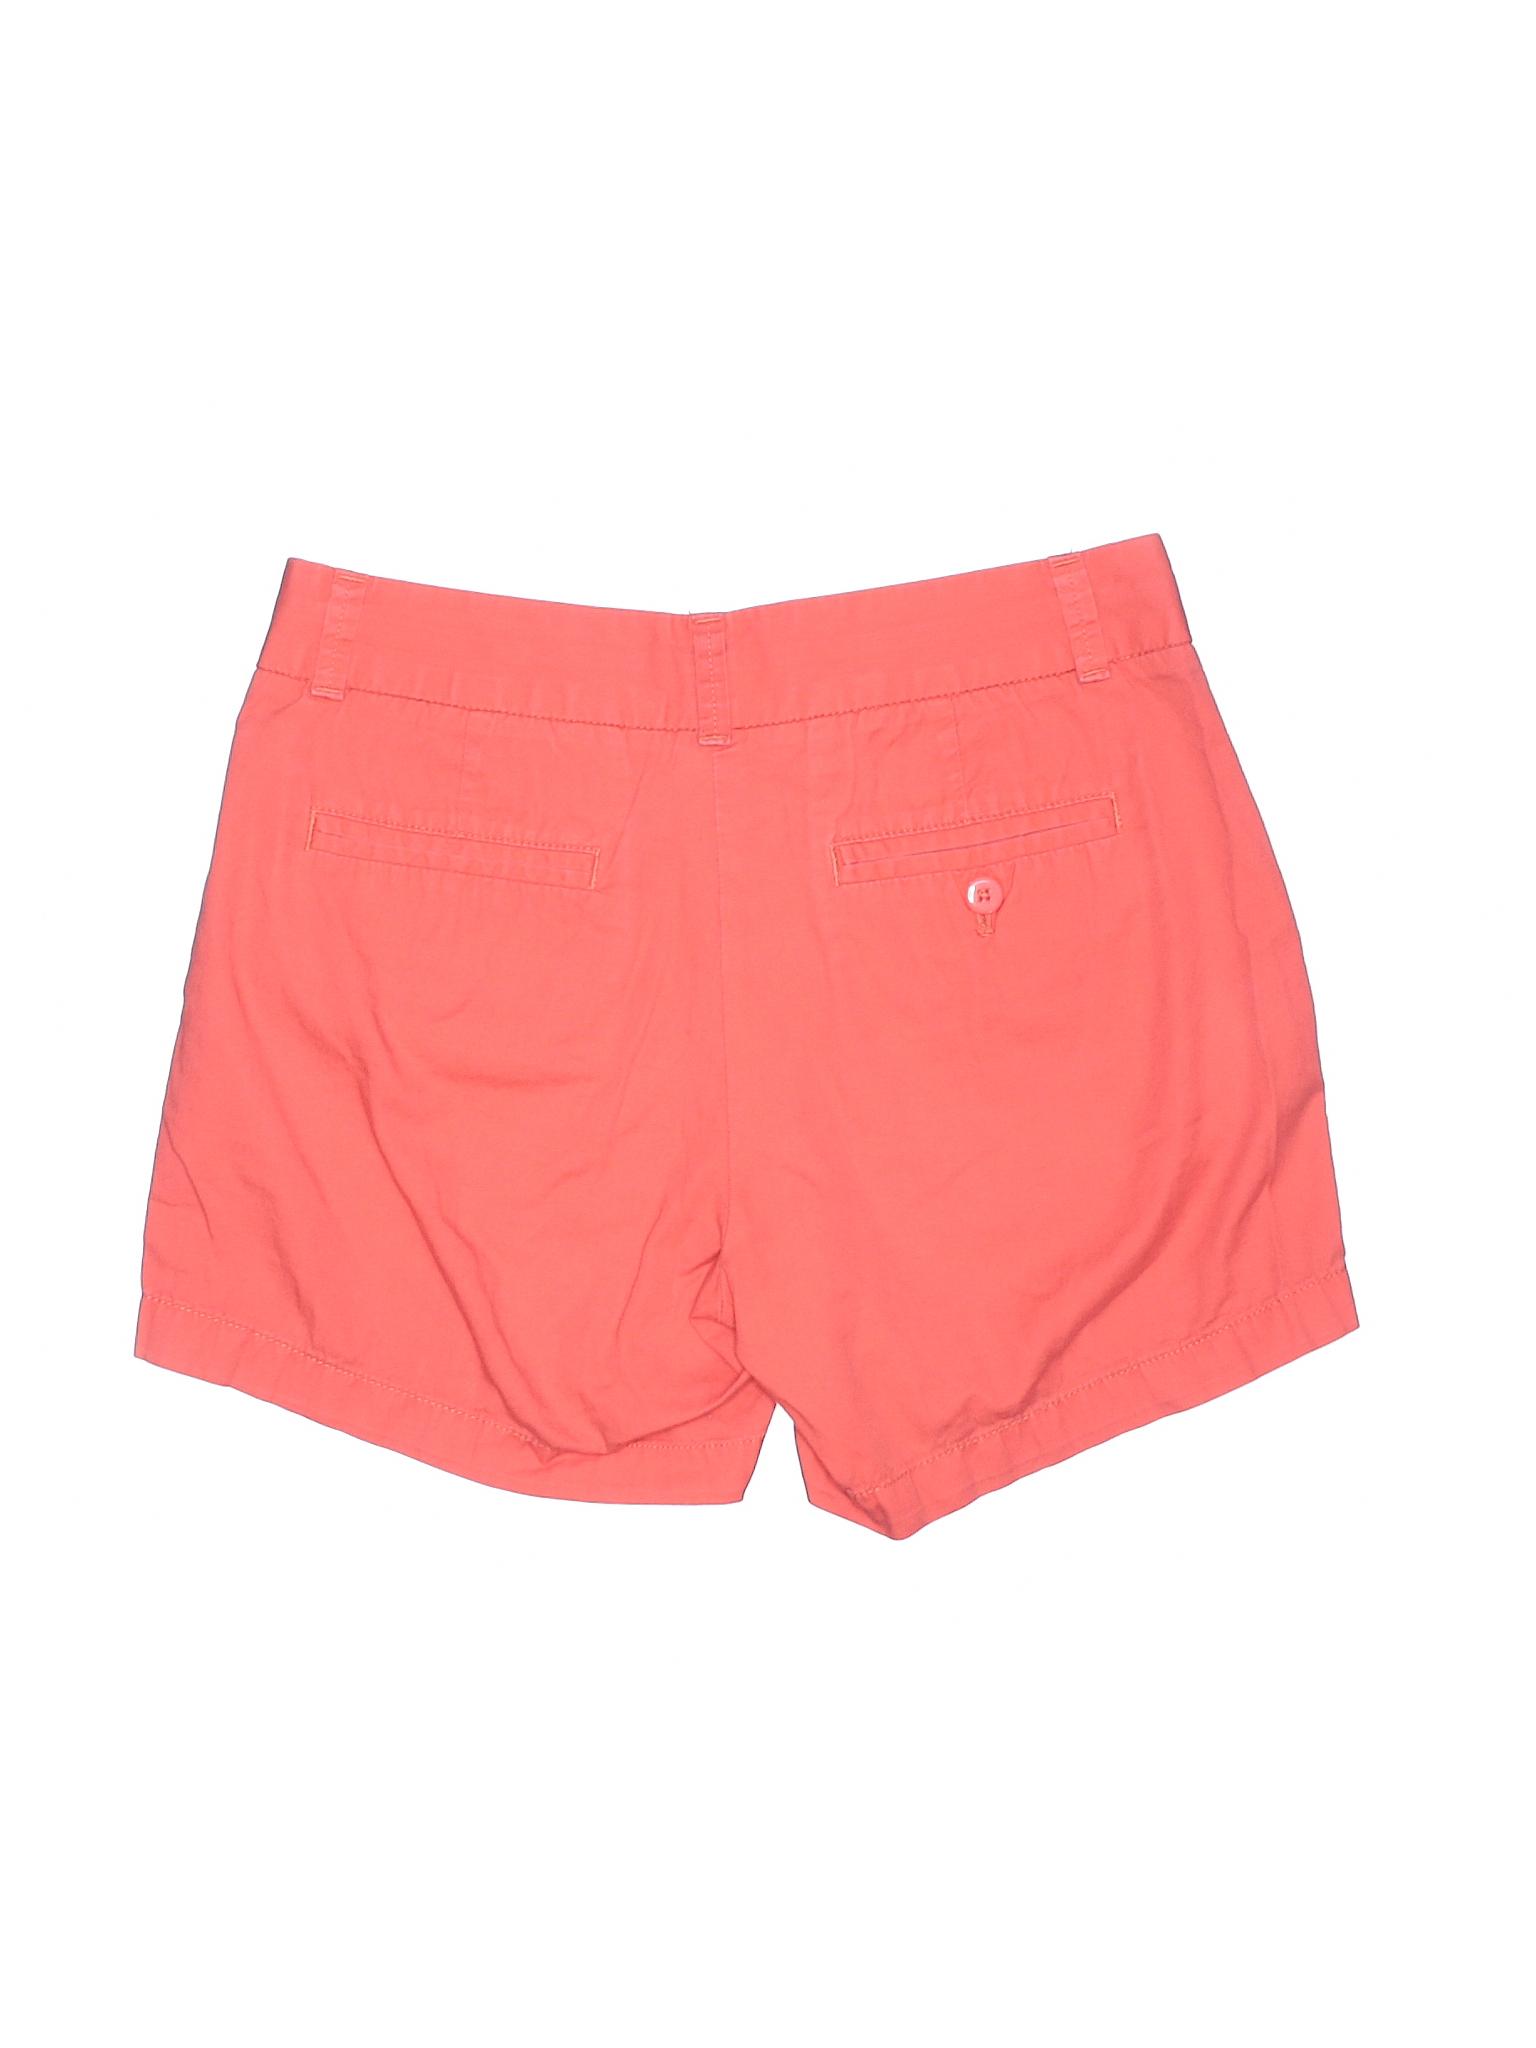 J Crew Store Shorts Khaki Boutique Factory 6dwPpF5x